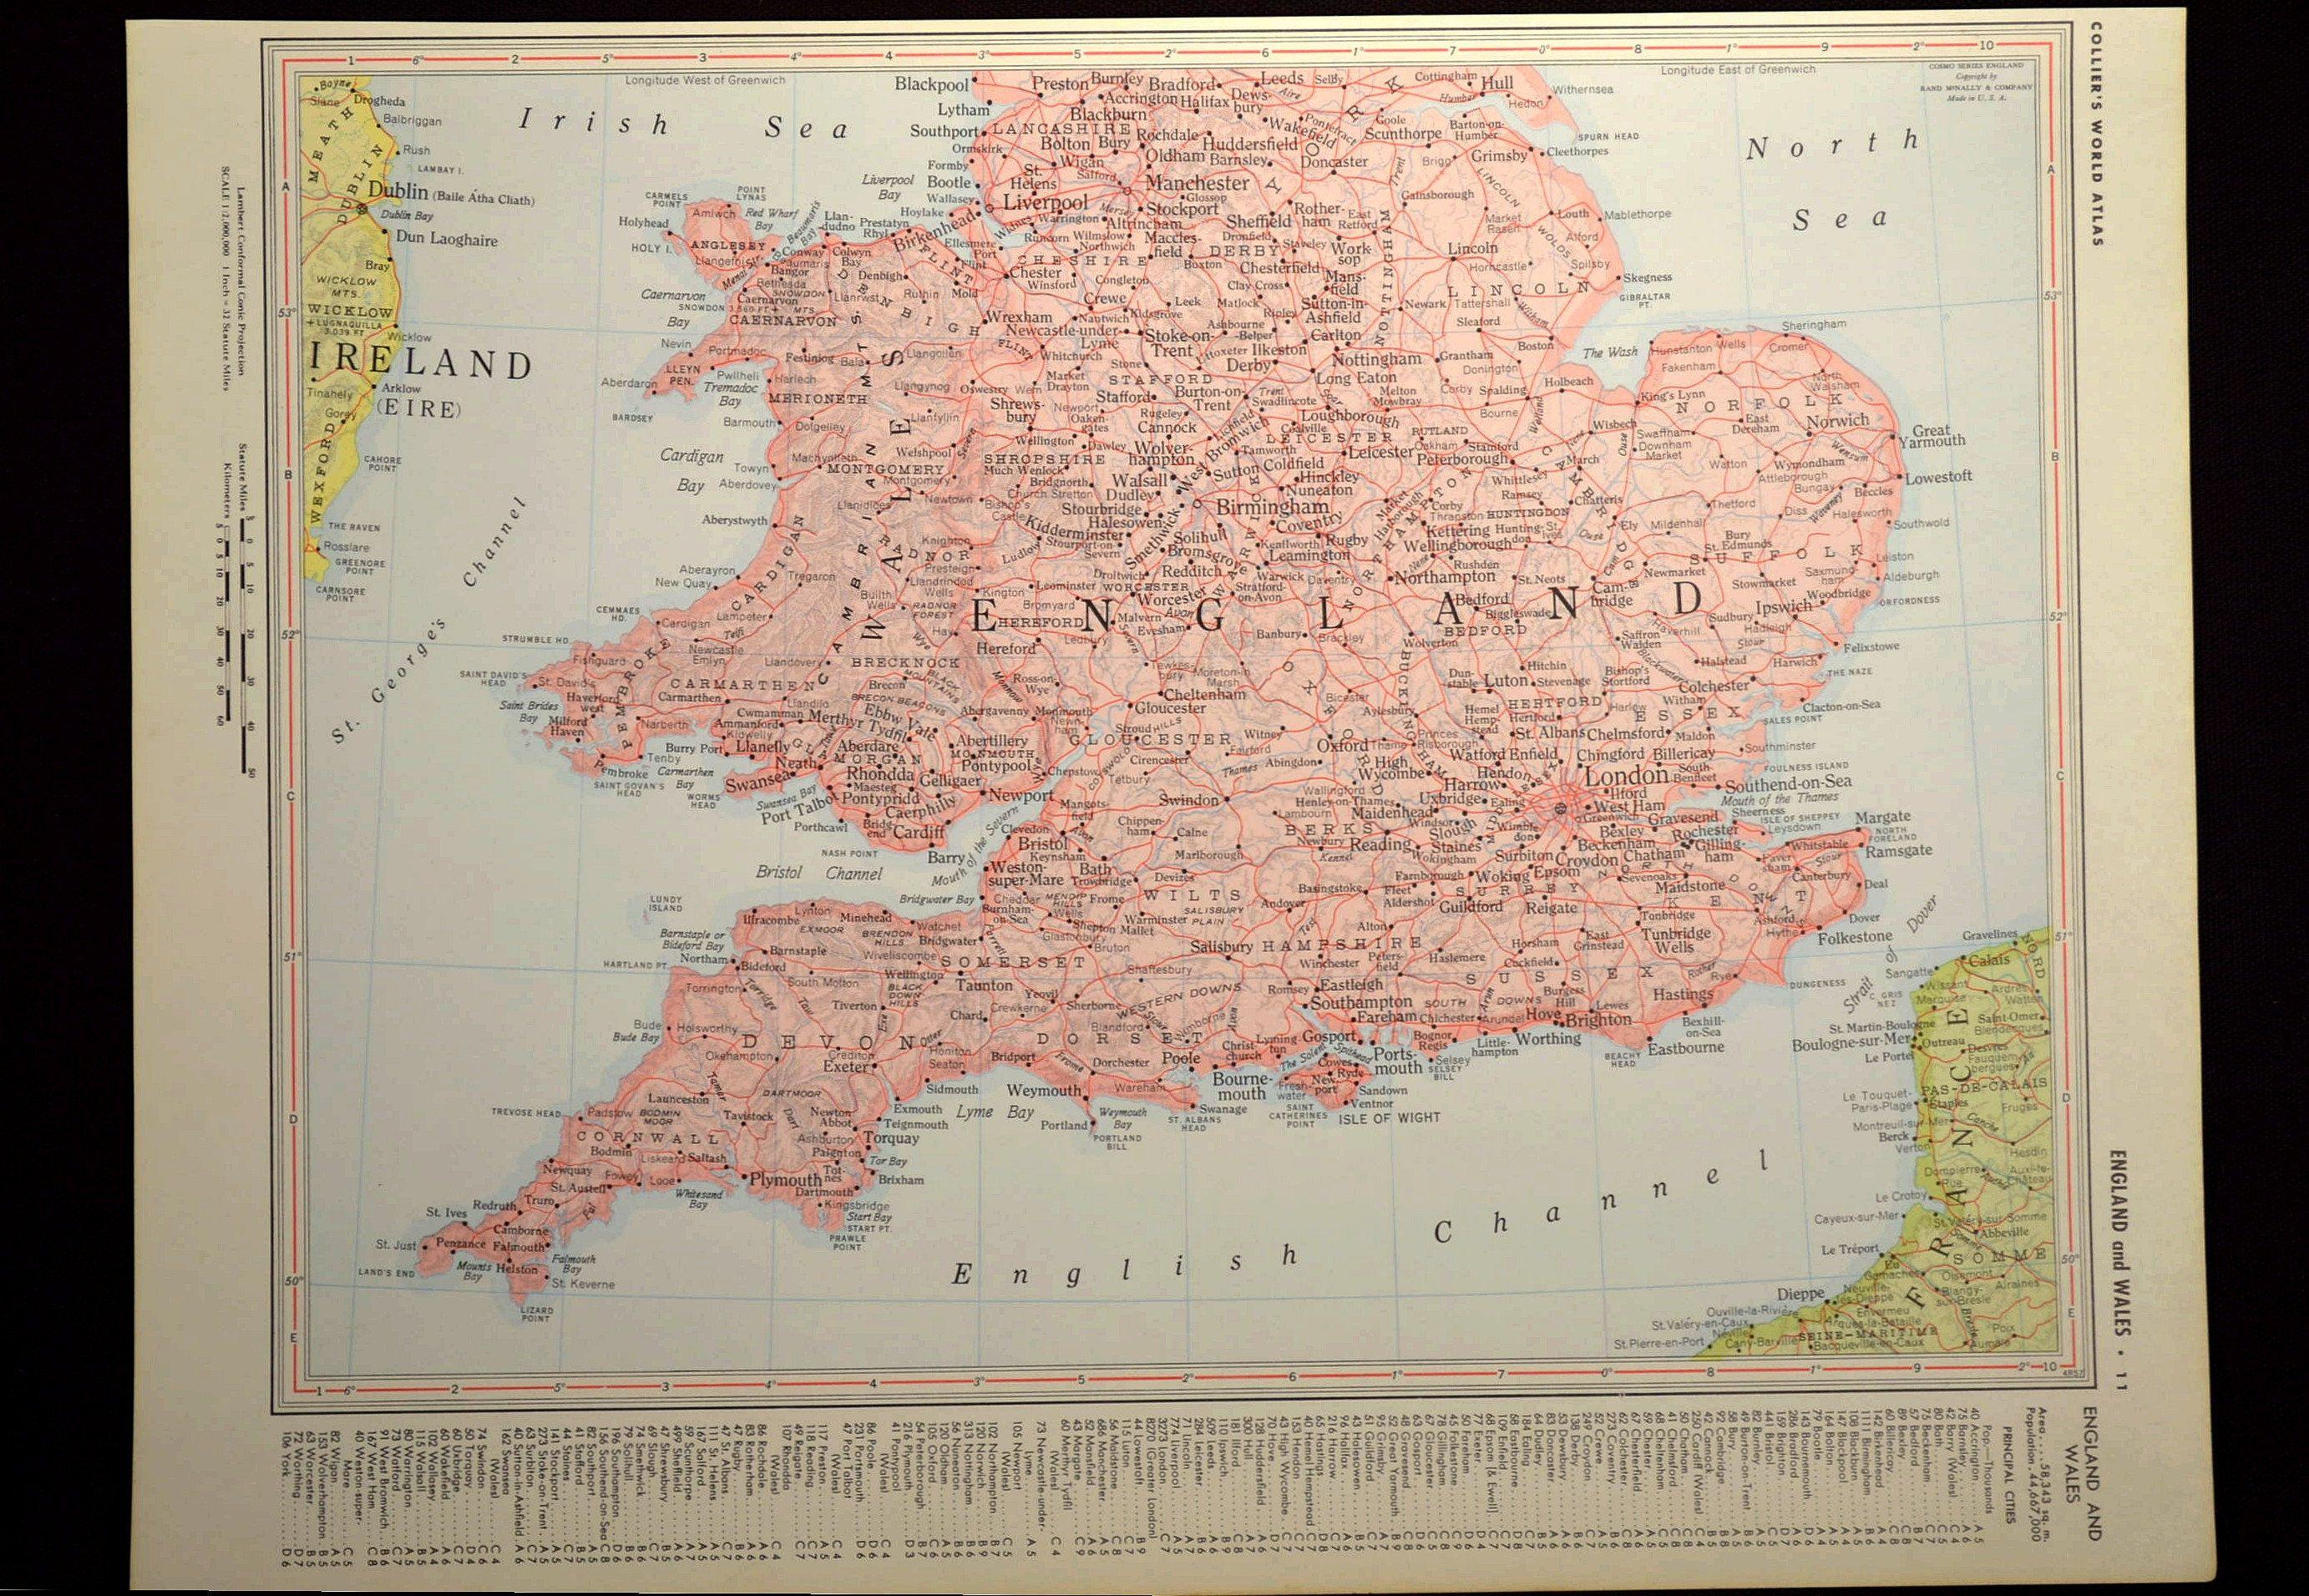 Map Of England Vintage.England Map Of England Wall Decor Art Vintage Wales Southern South